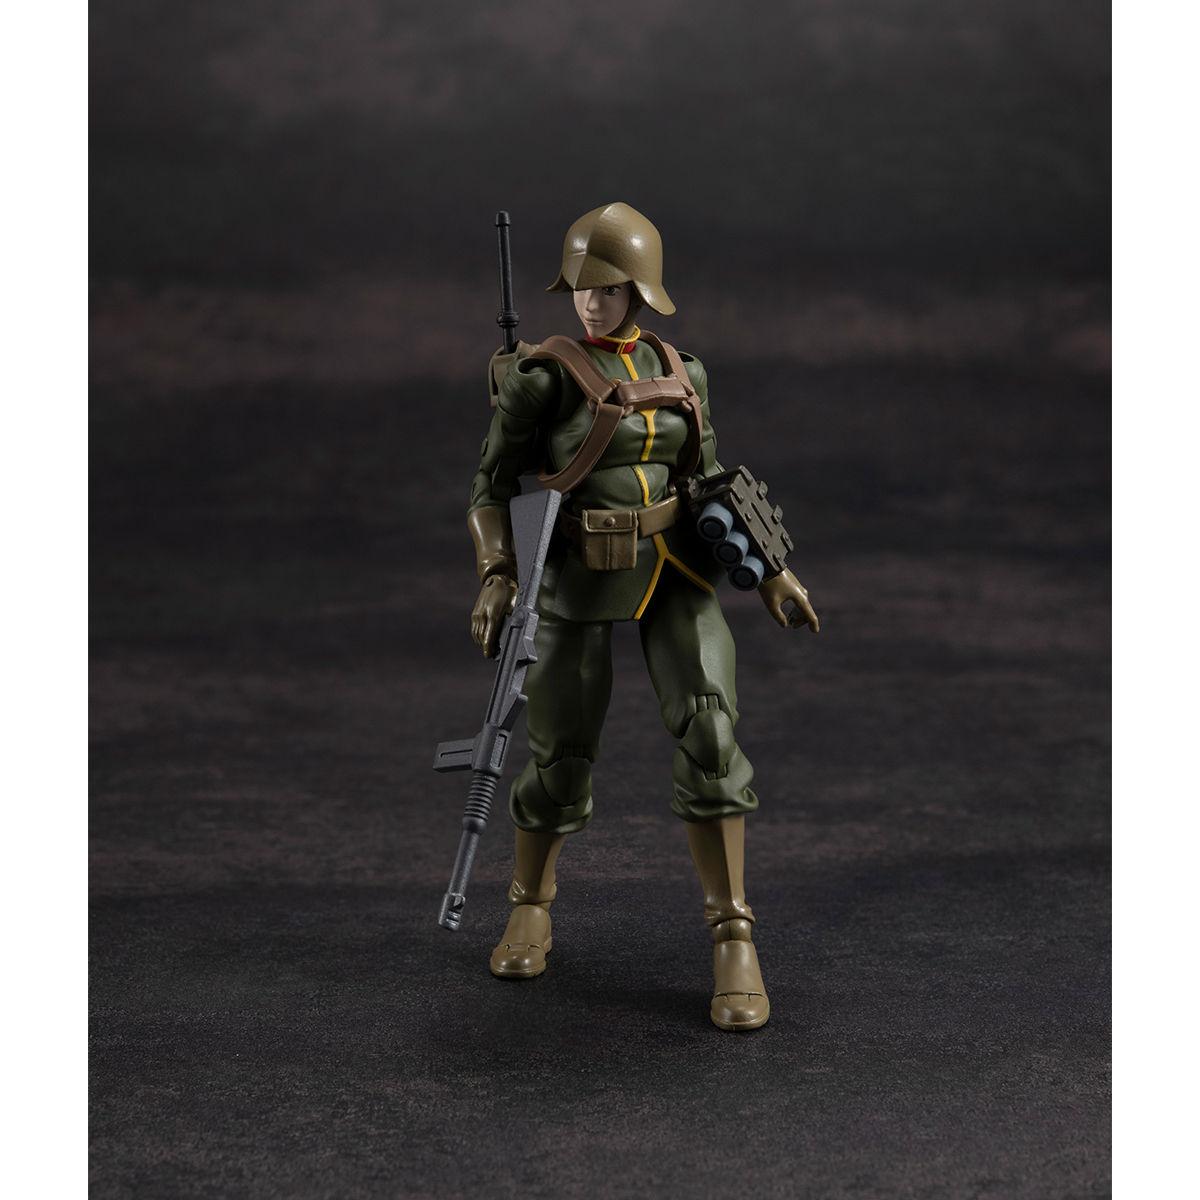 G.M.G. ガンダムミリタリージェネレーション『ジオン公国軍一般兵士01』1/18 可動フィギュア-020